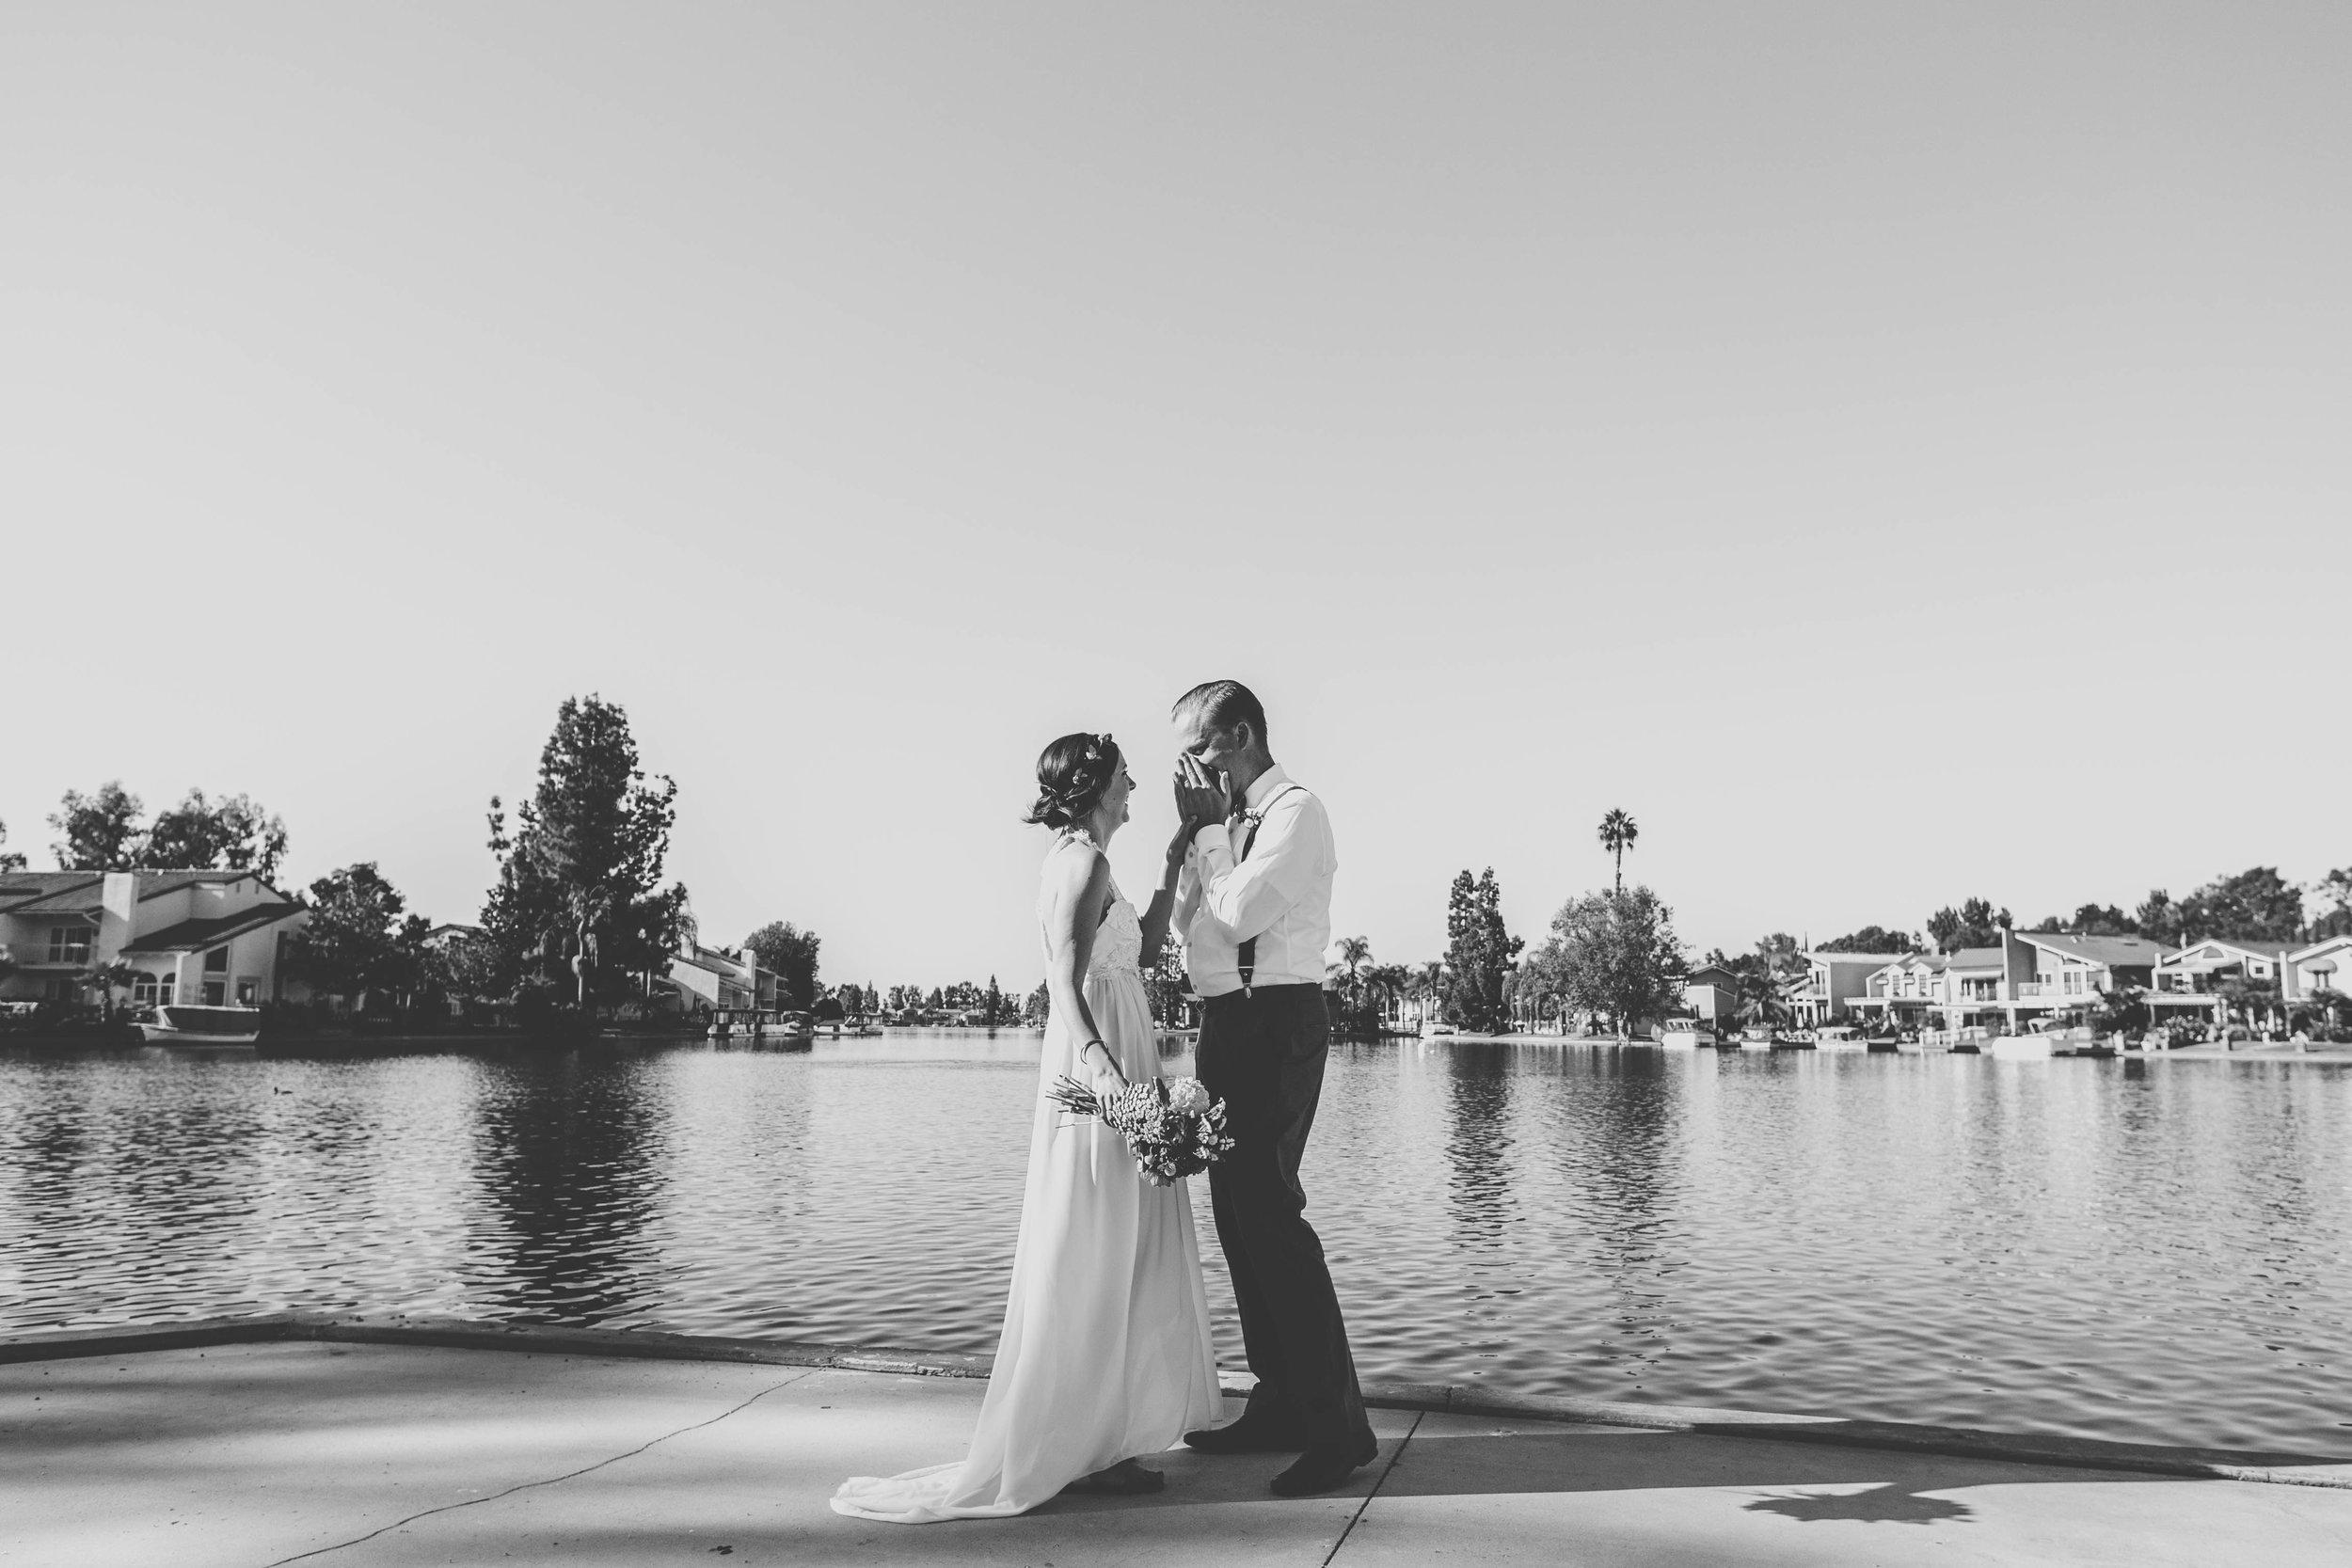 20141024-DePartee-Wedding-APavone-028-sm.jpg